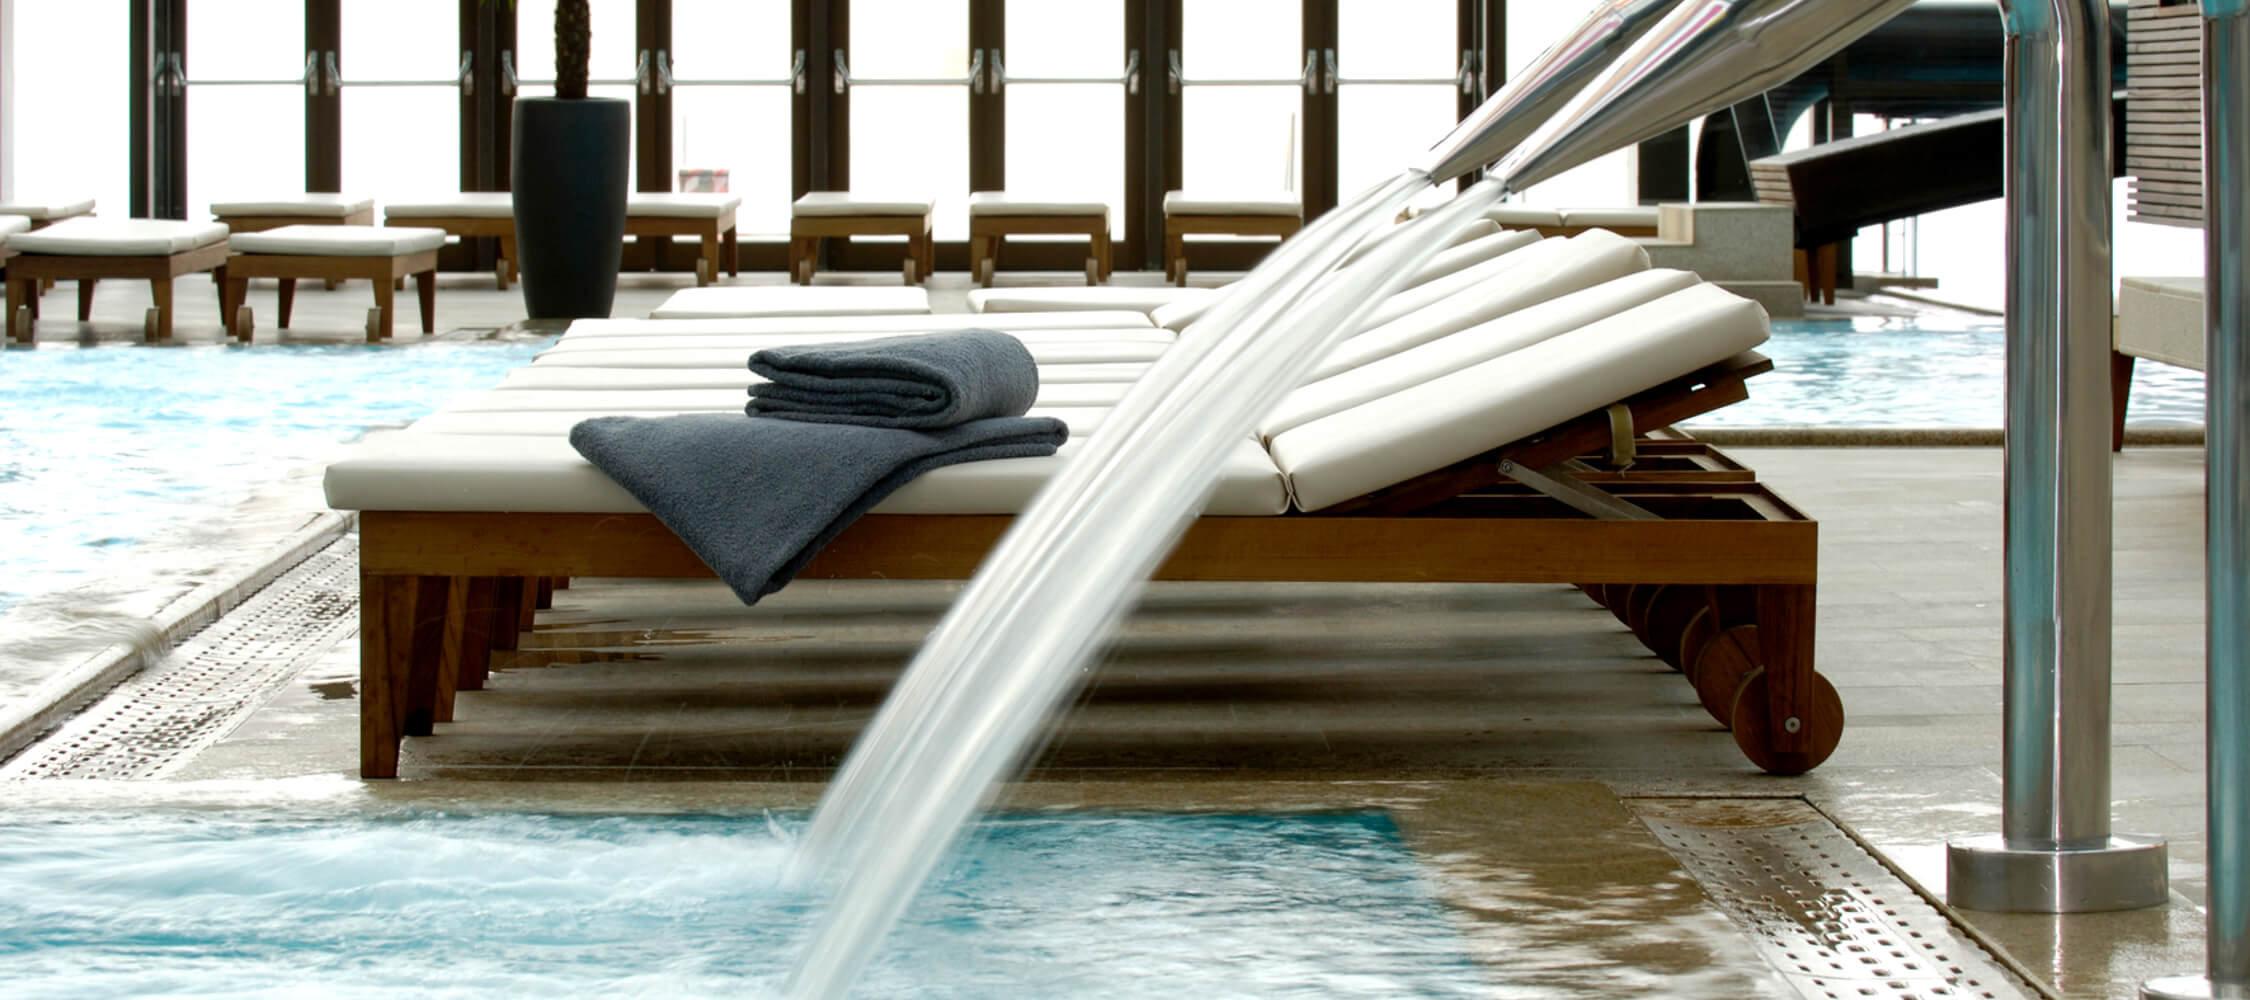 Italien-Trentino_Suedtirol_Alto_Adige_Merano_Meran_Therme_Pool_Badehalle_Schwimmbad_Helmuth_Rier_2250x1000